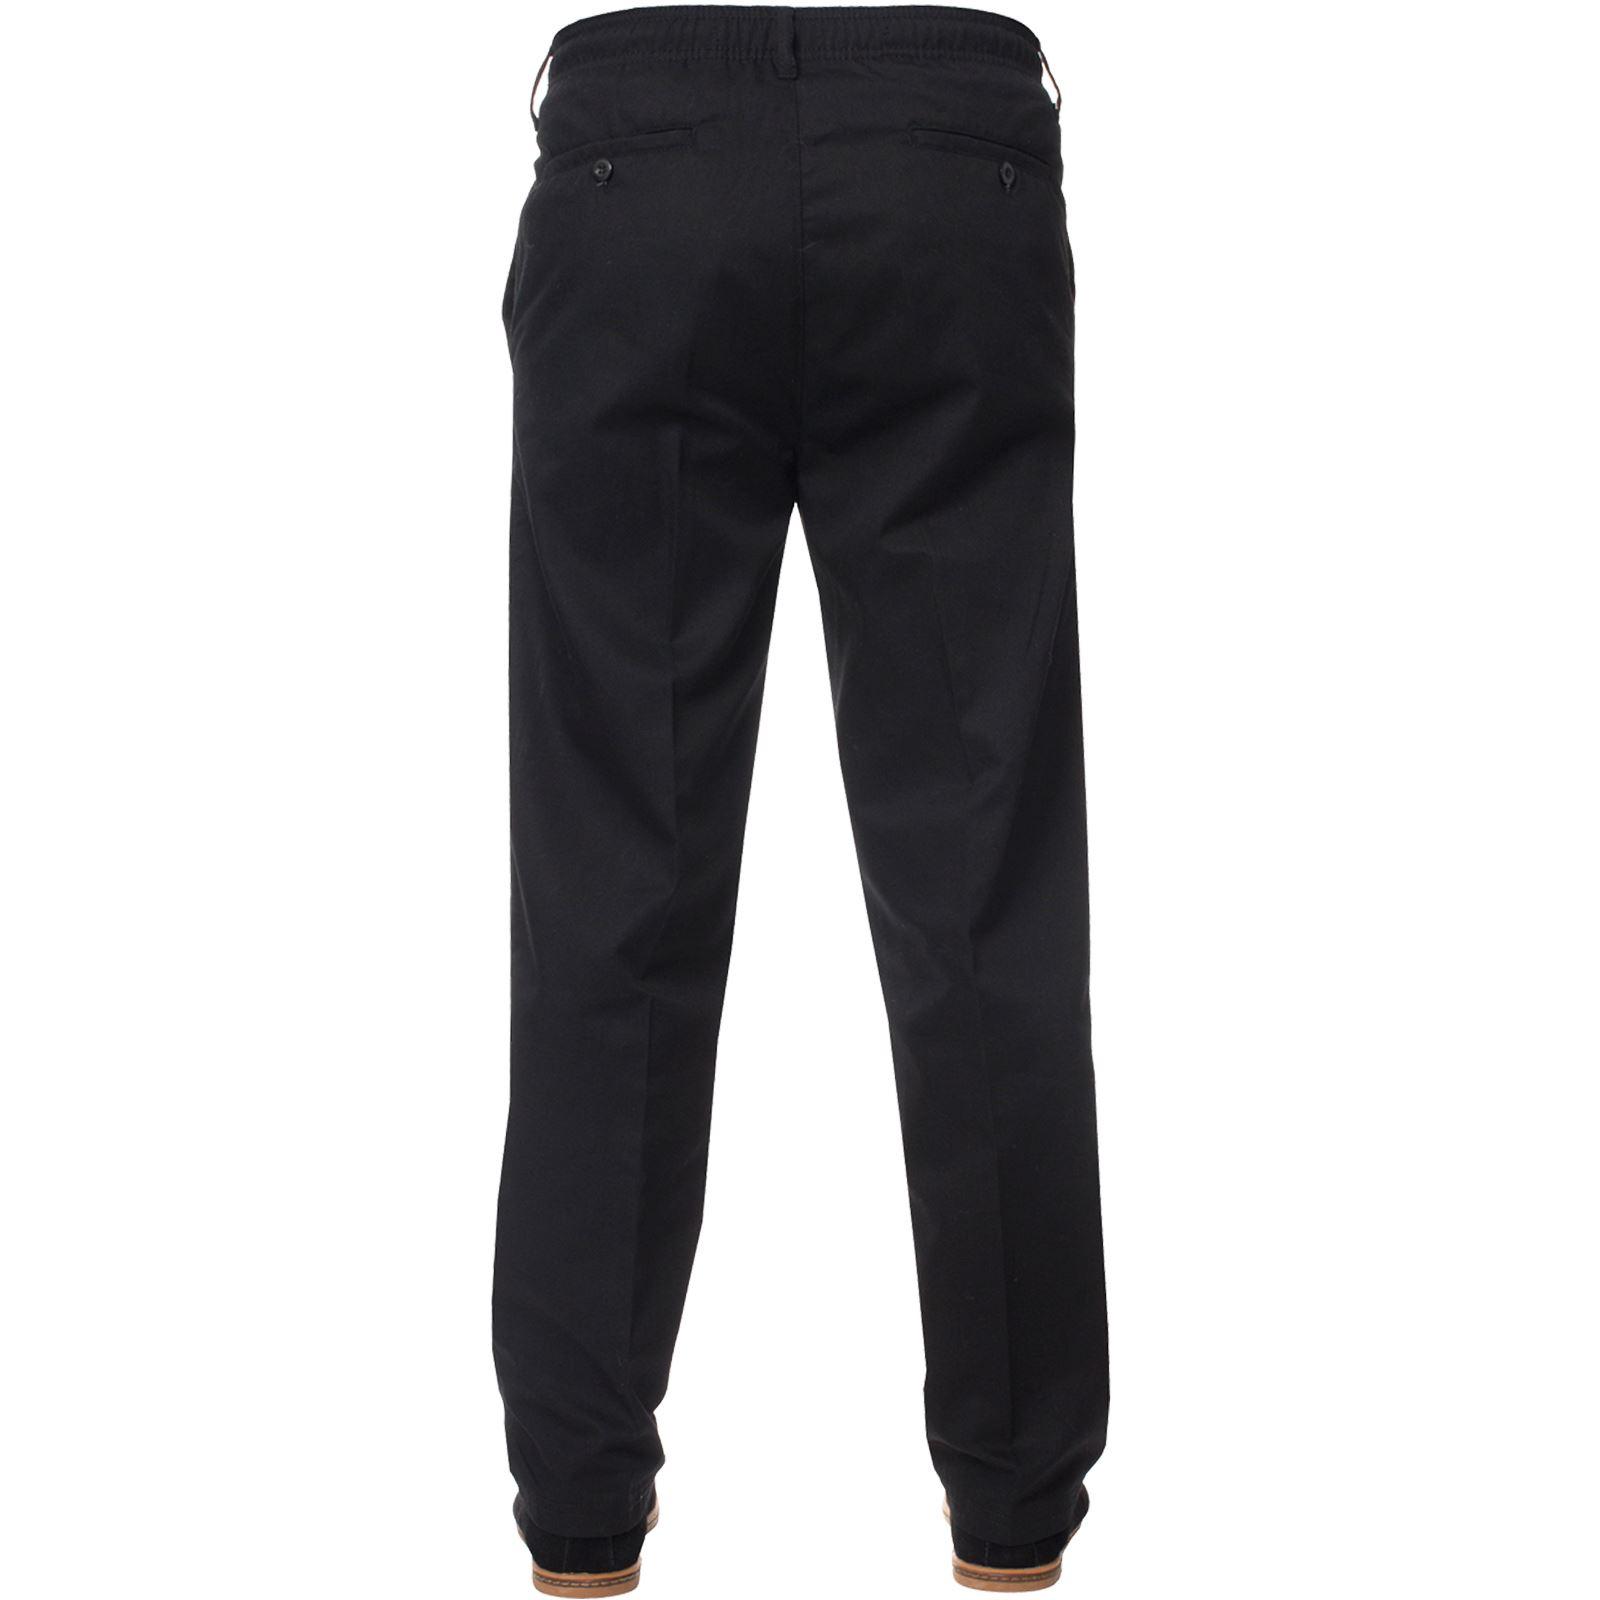 Para-Hombres-Pantalones-De-Rugby-Kruze-cintura-elastica-con-cordon-pantalones-REGULAR-King-Tamanos miniatura 4